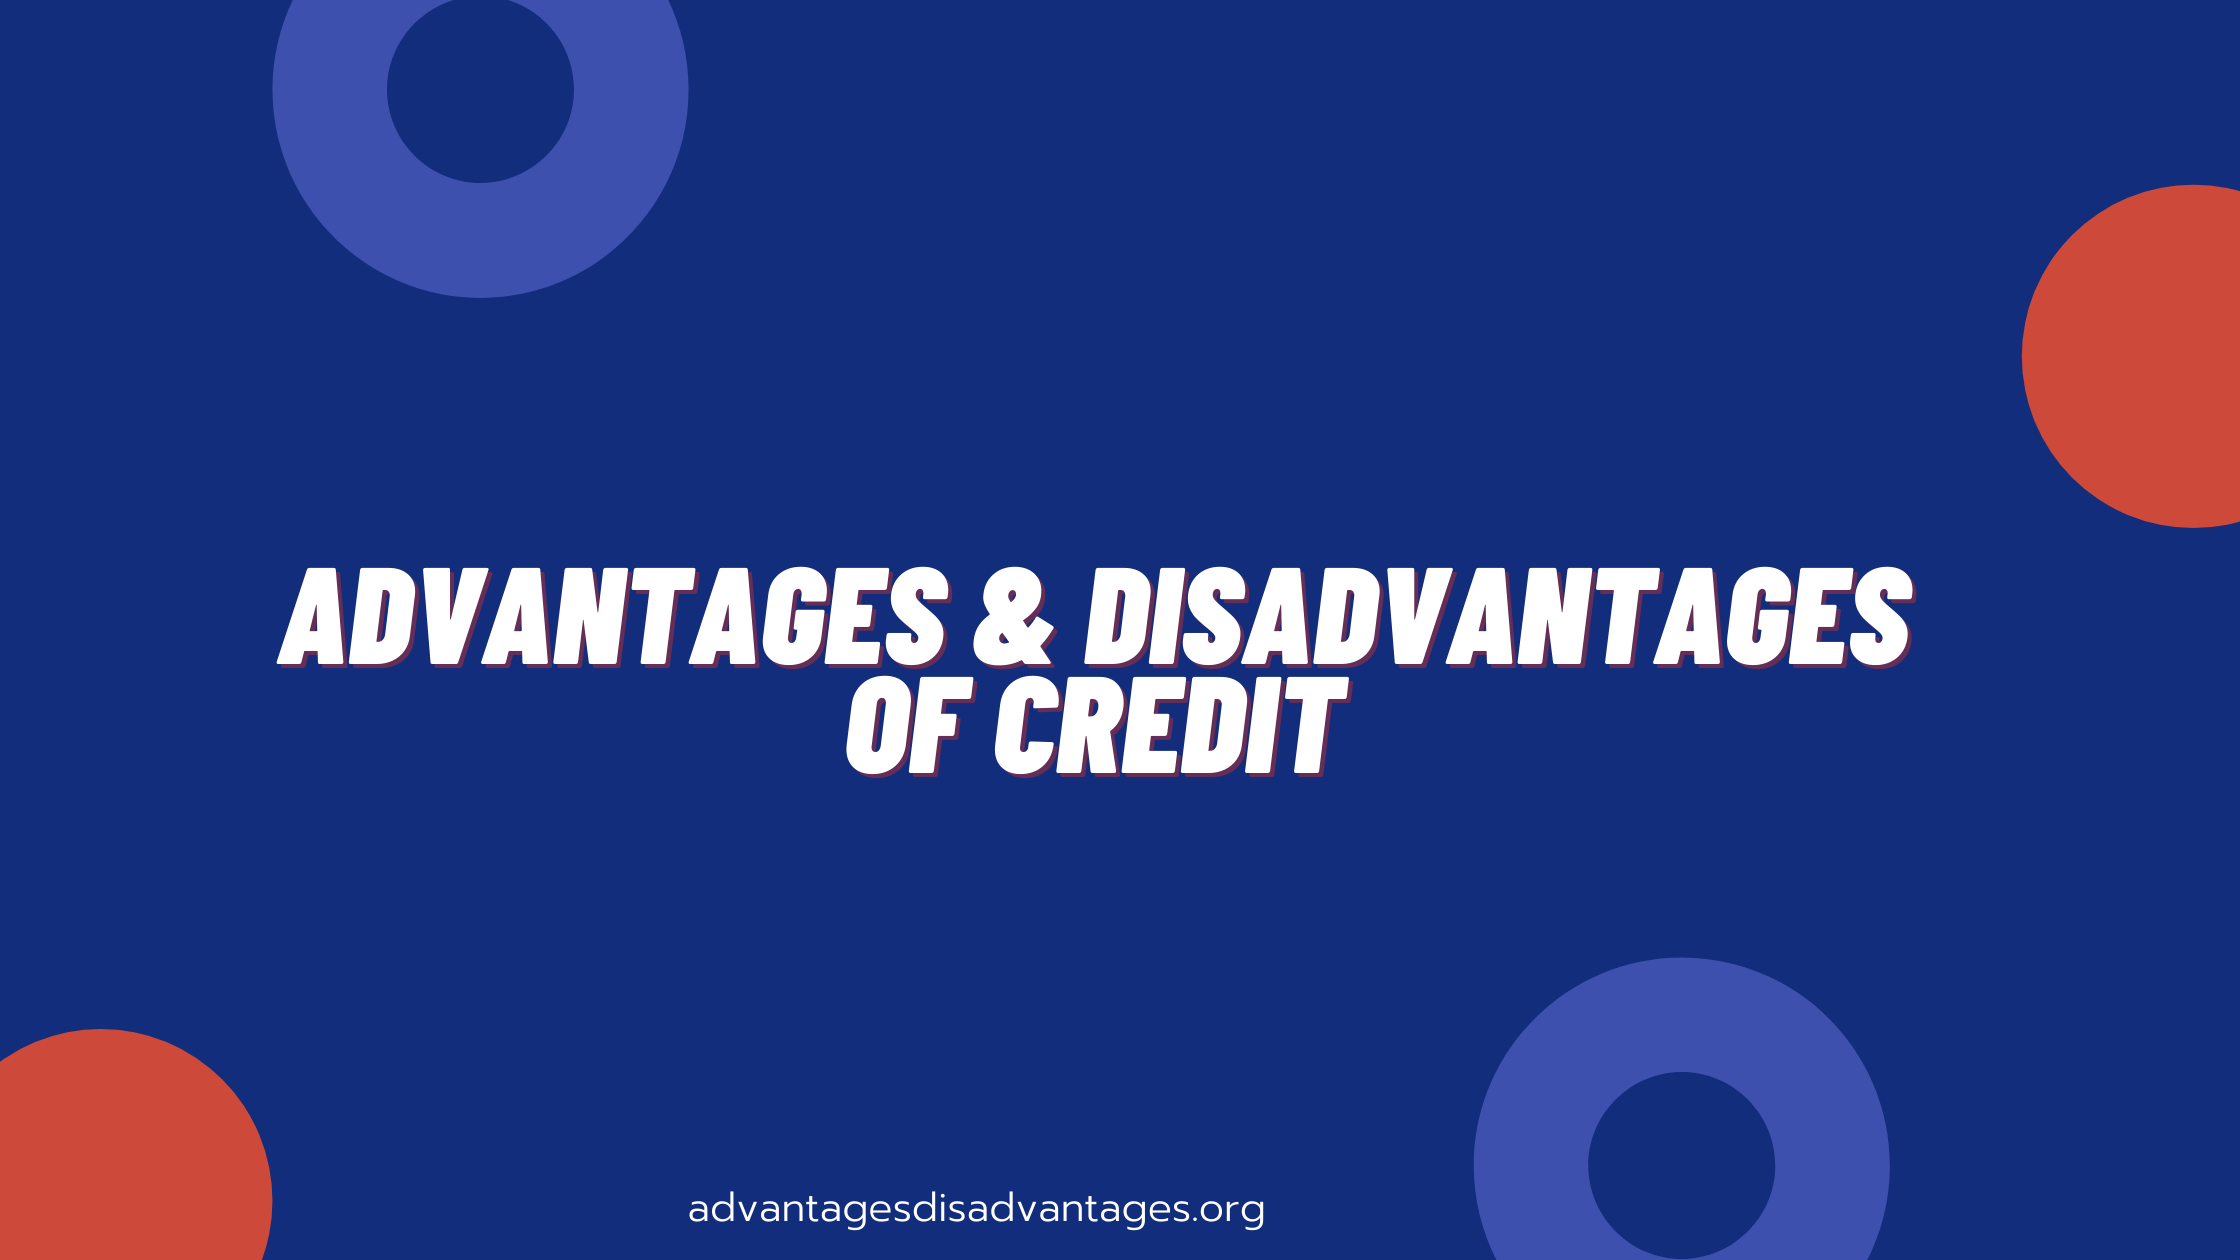 Advantages and Disadvantages of Credit